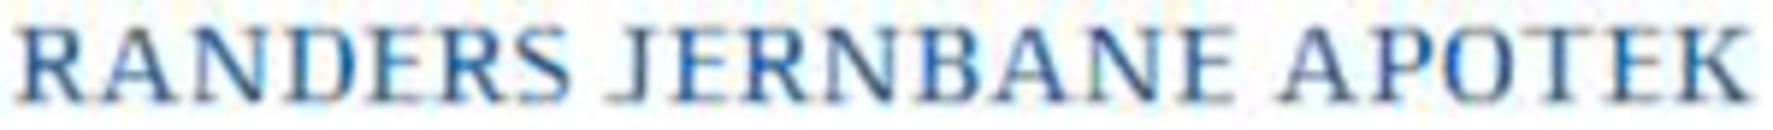 Jernbane Apoteket Randers logo